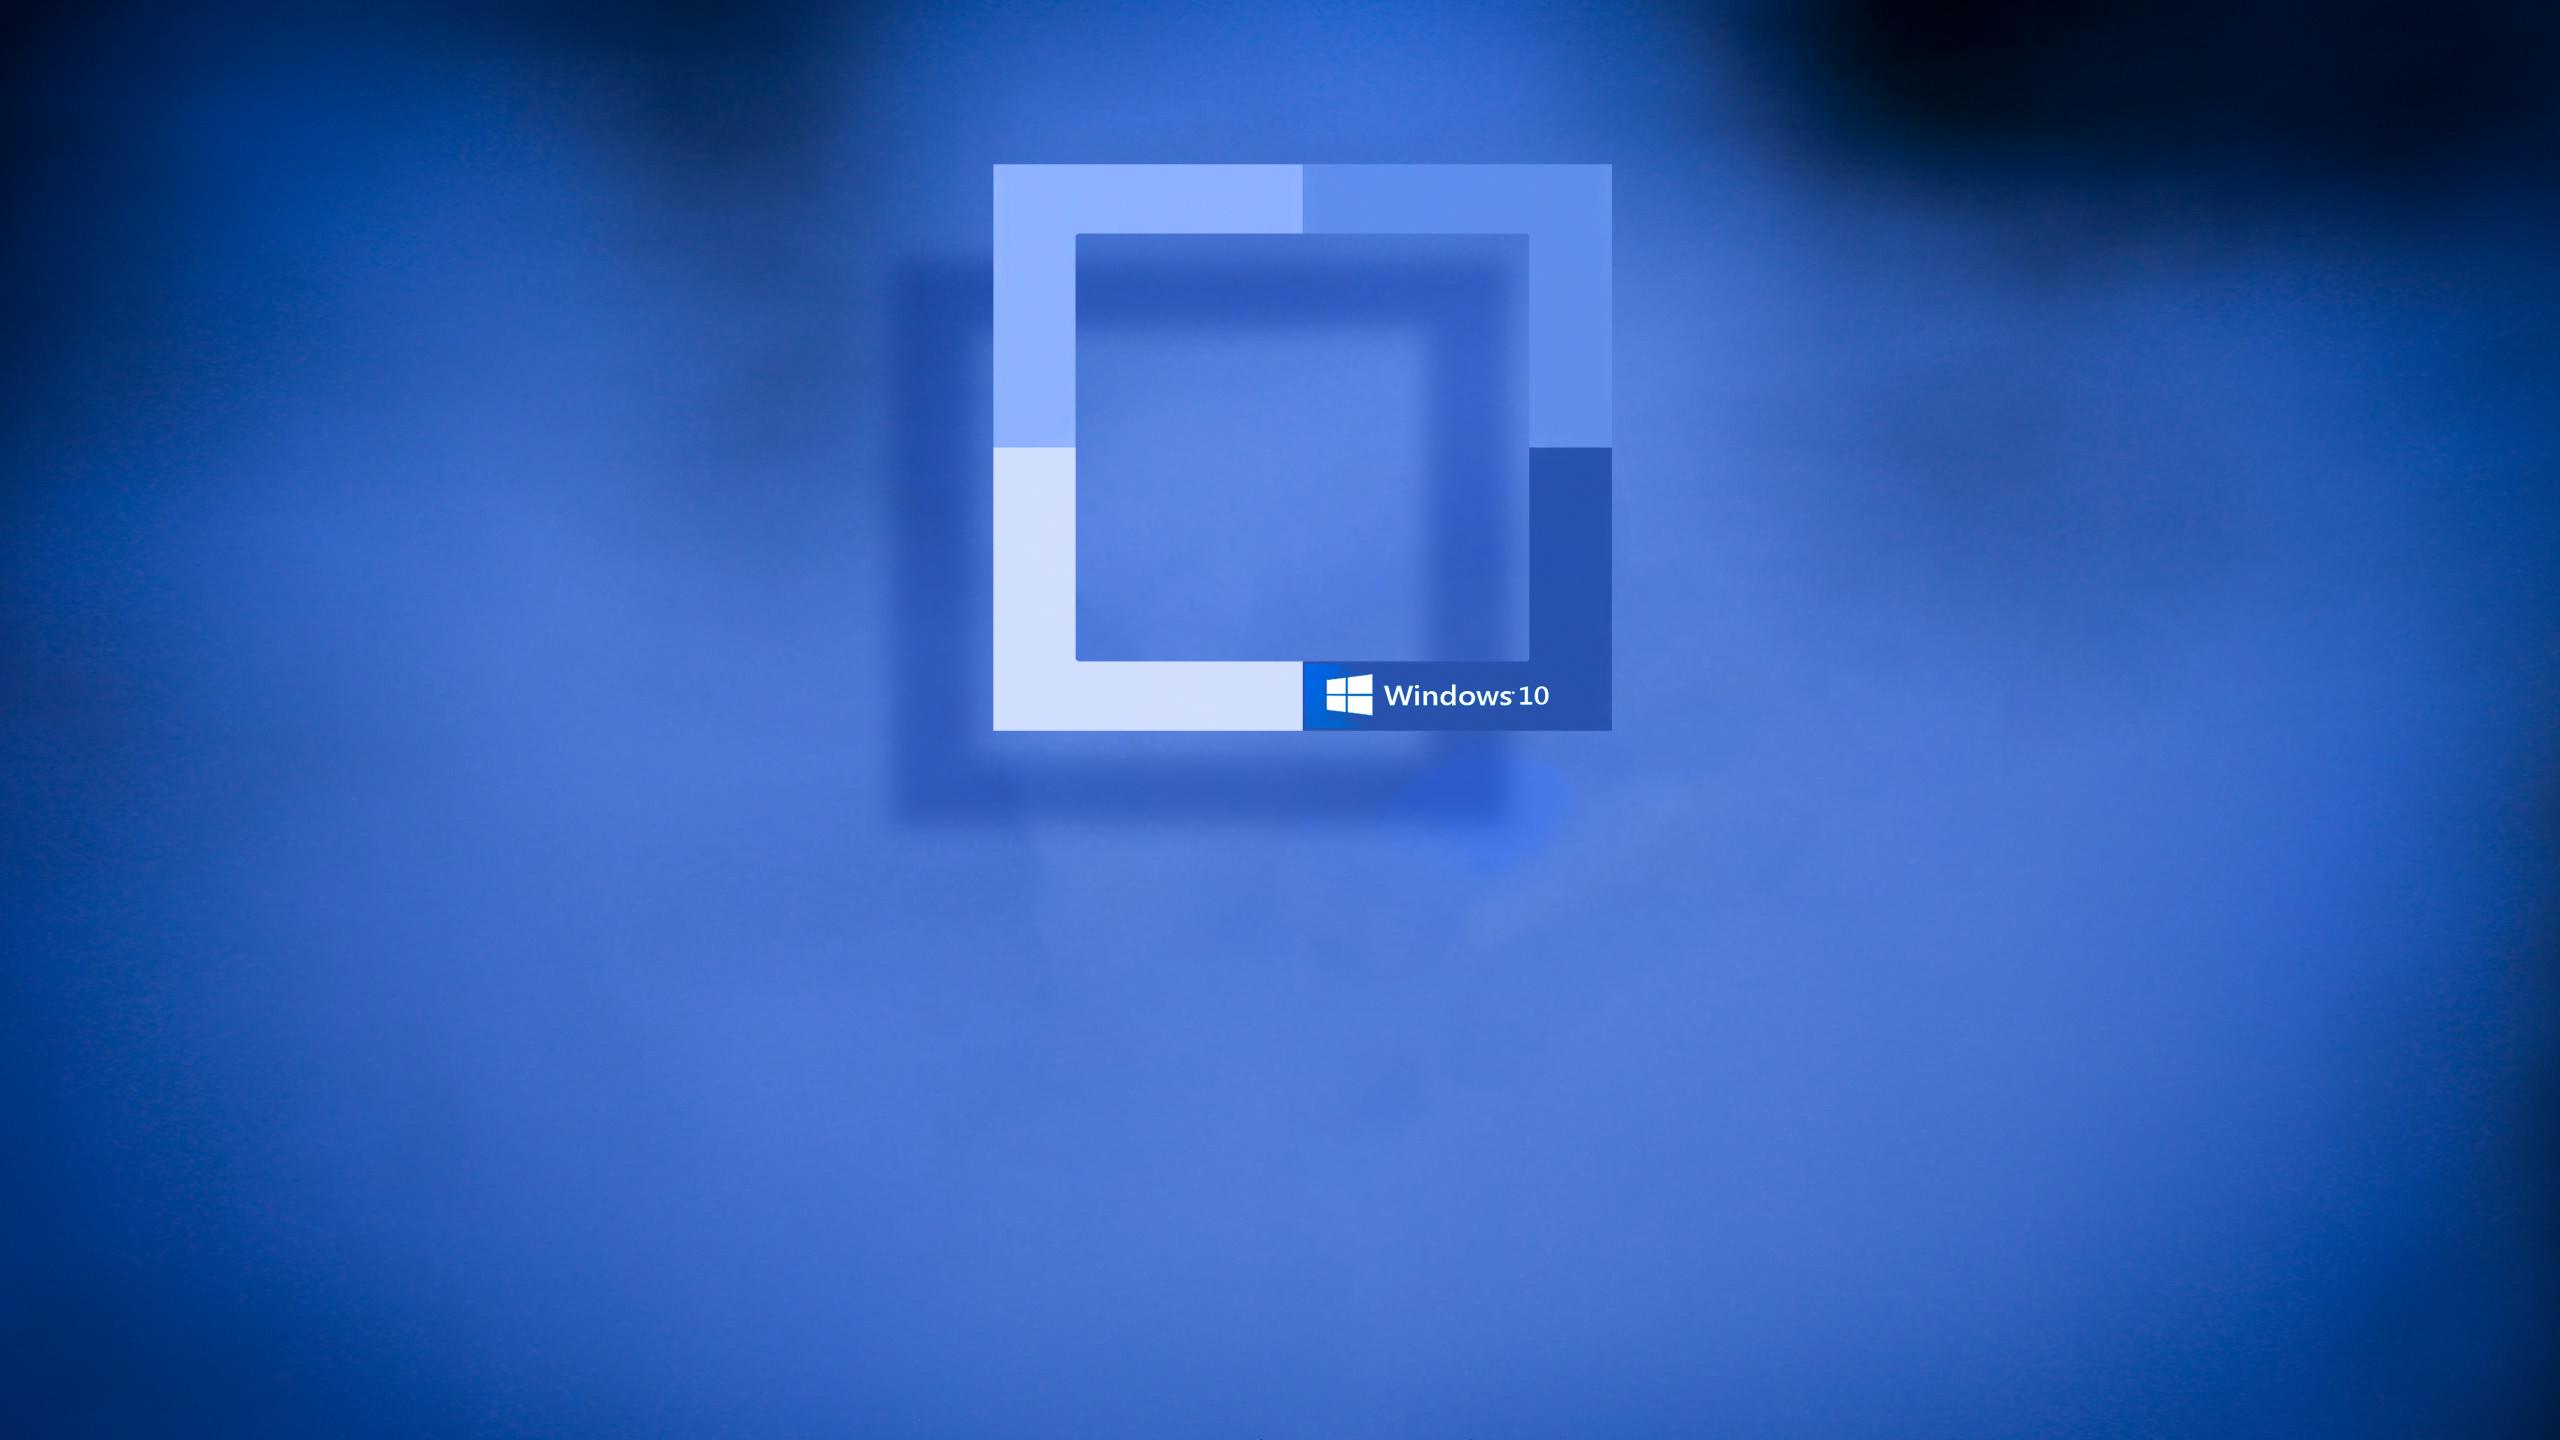 hd wallpapers for windows 10   pixelstalk